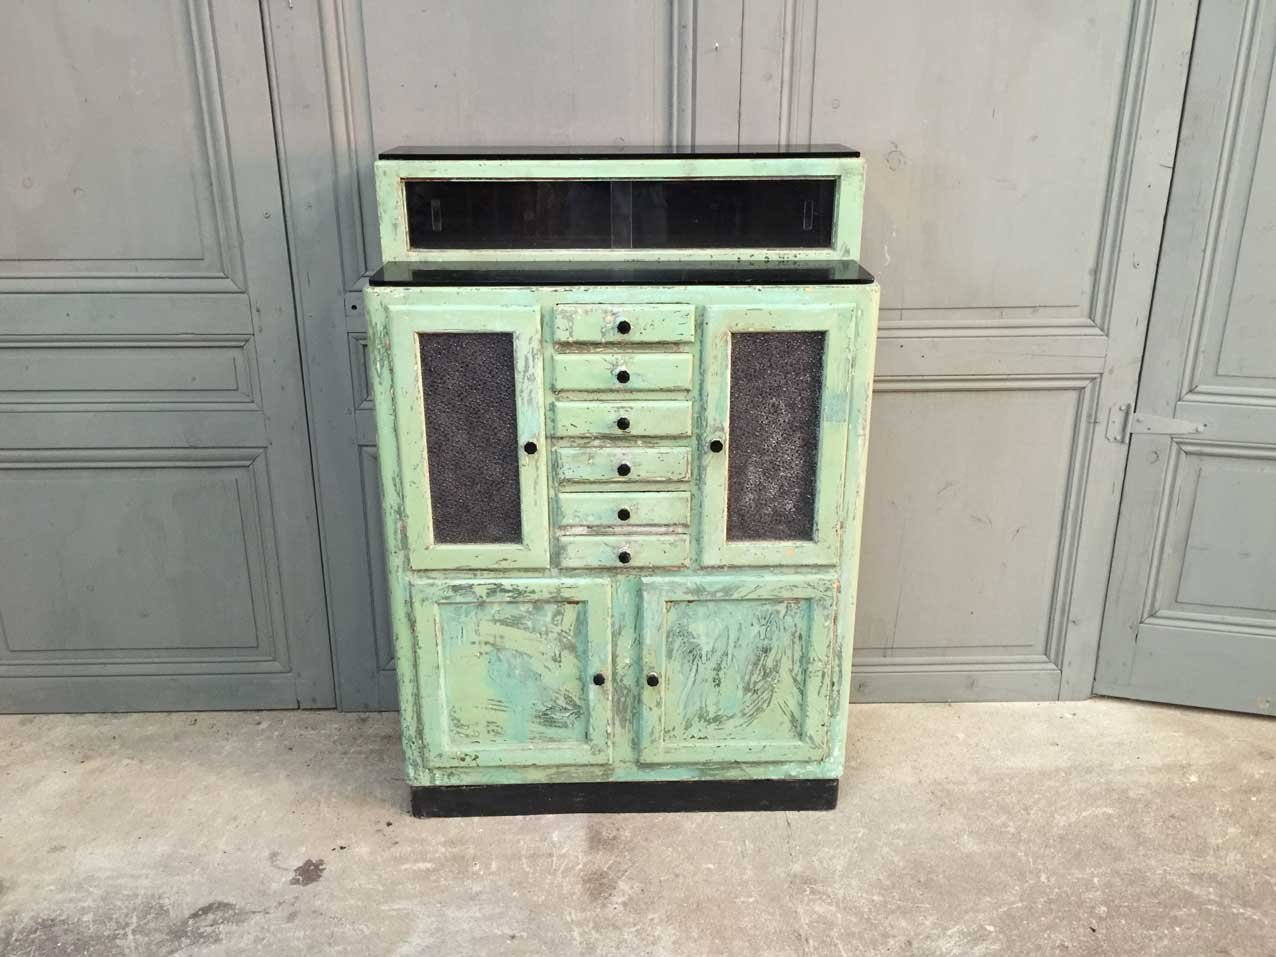 Mueble de dentista franc s de madera a os 50 en venta en pamono - Mueble anos 50 ...